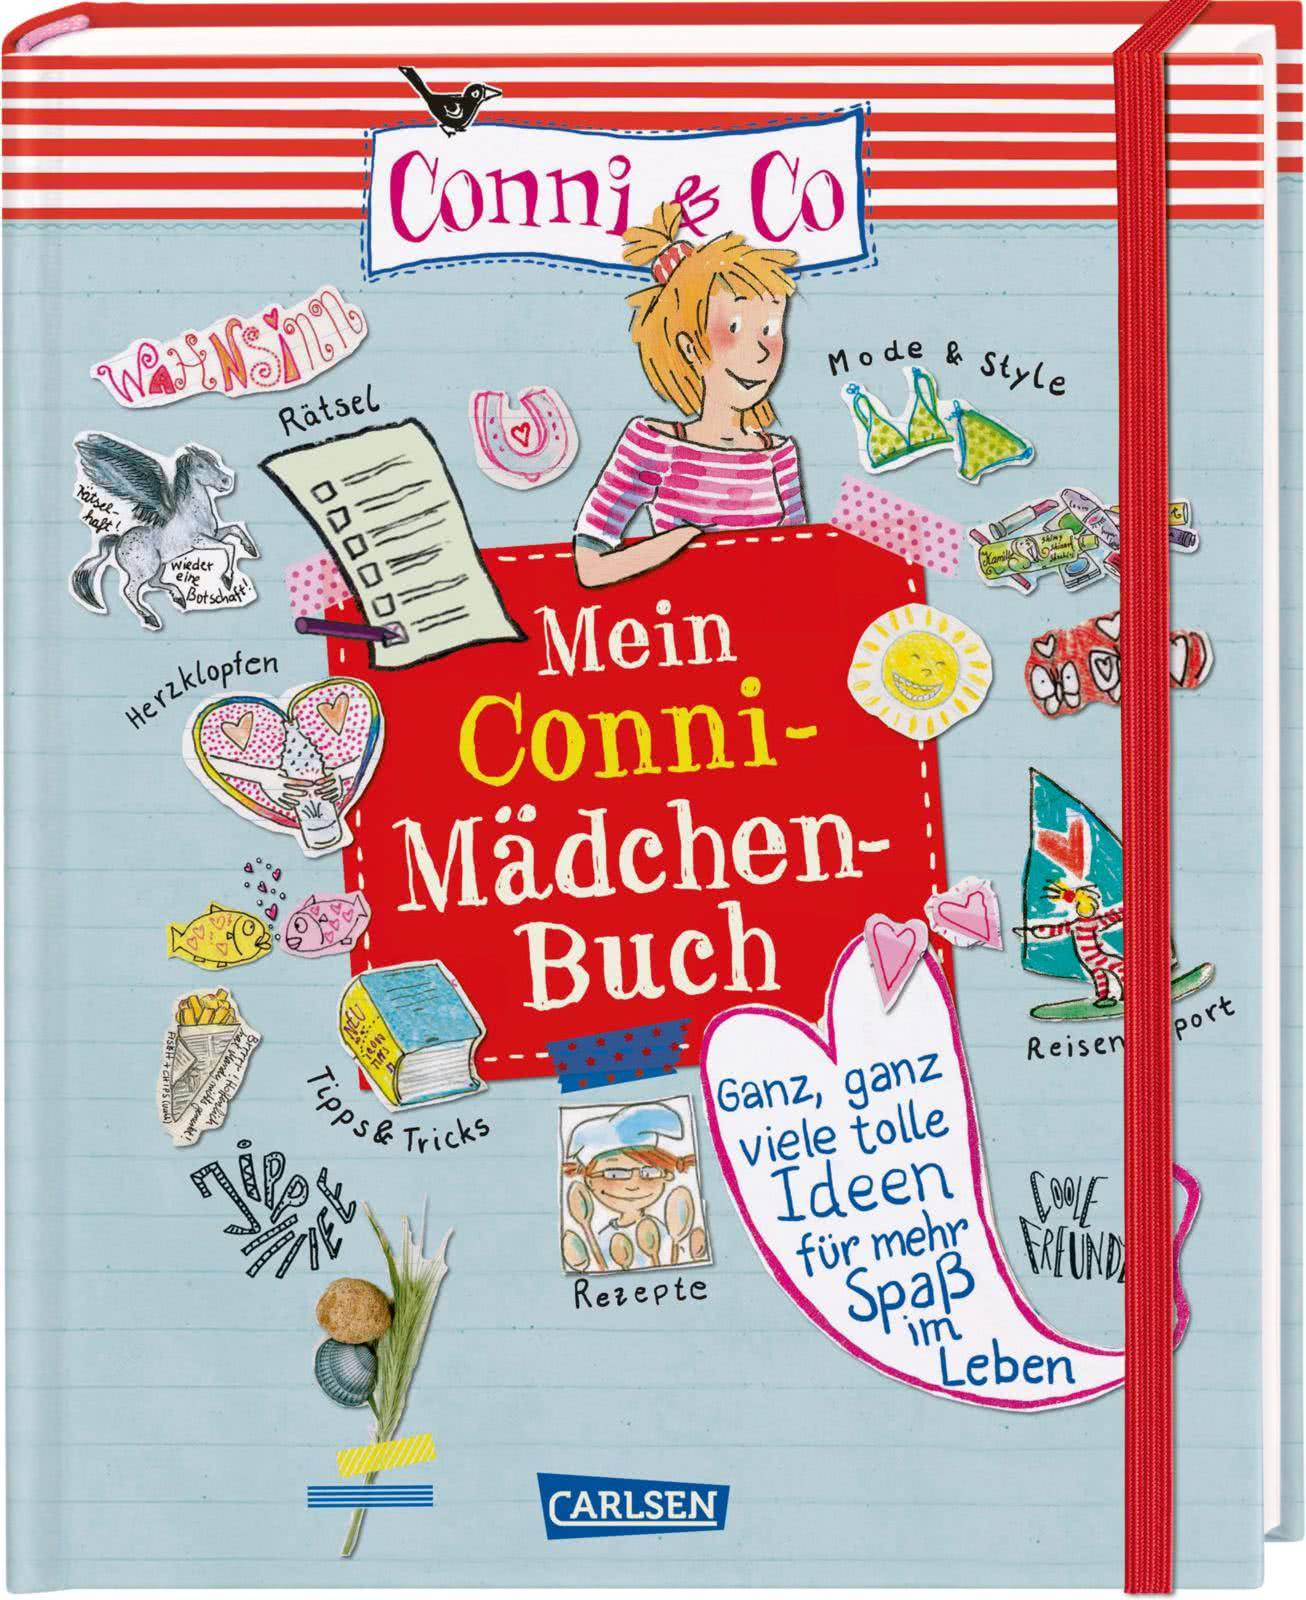 conni  co mein connimädchenbuch  carlsen